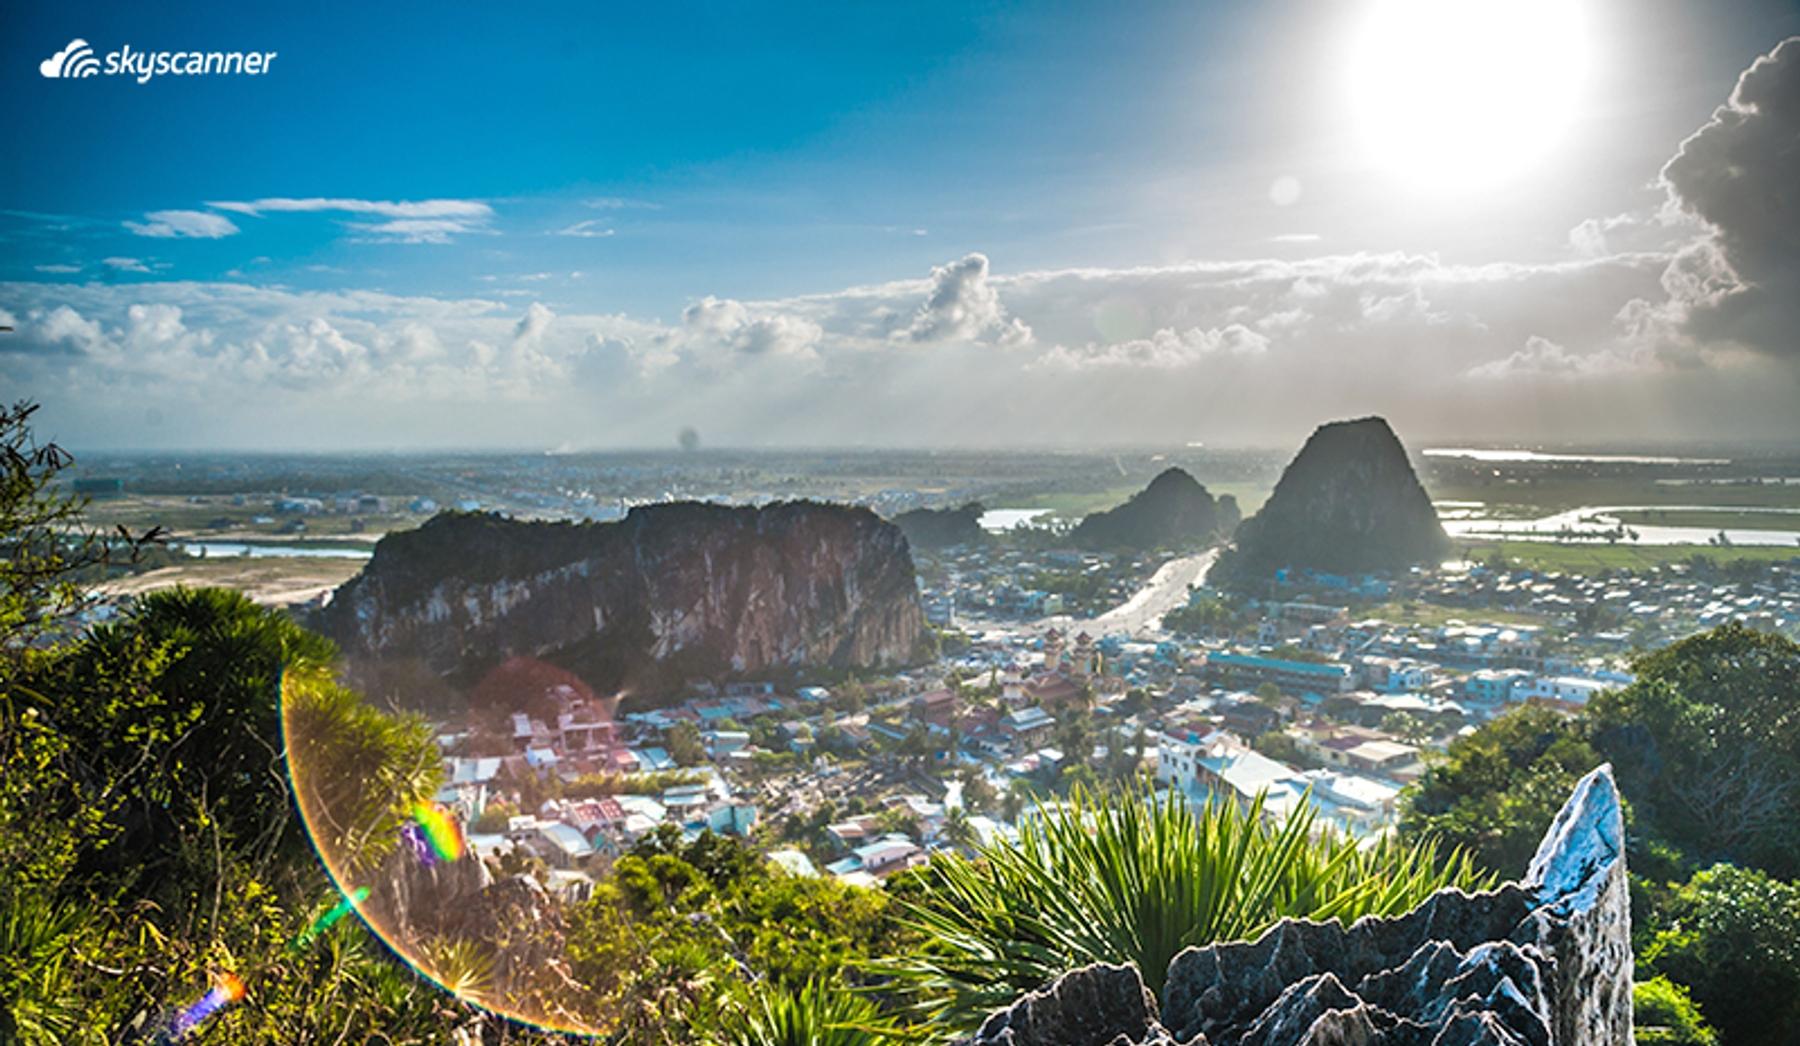 Da Nang is a great destination for cheap beach holidays